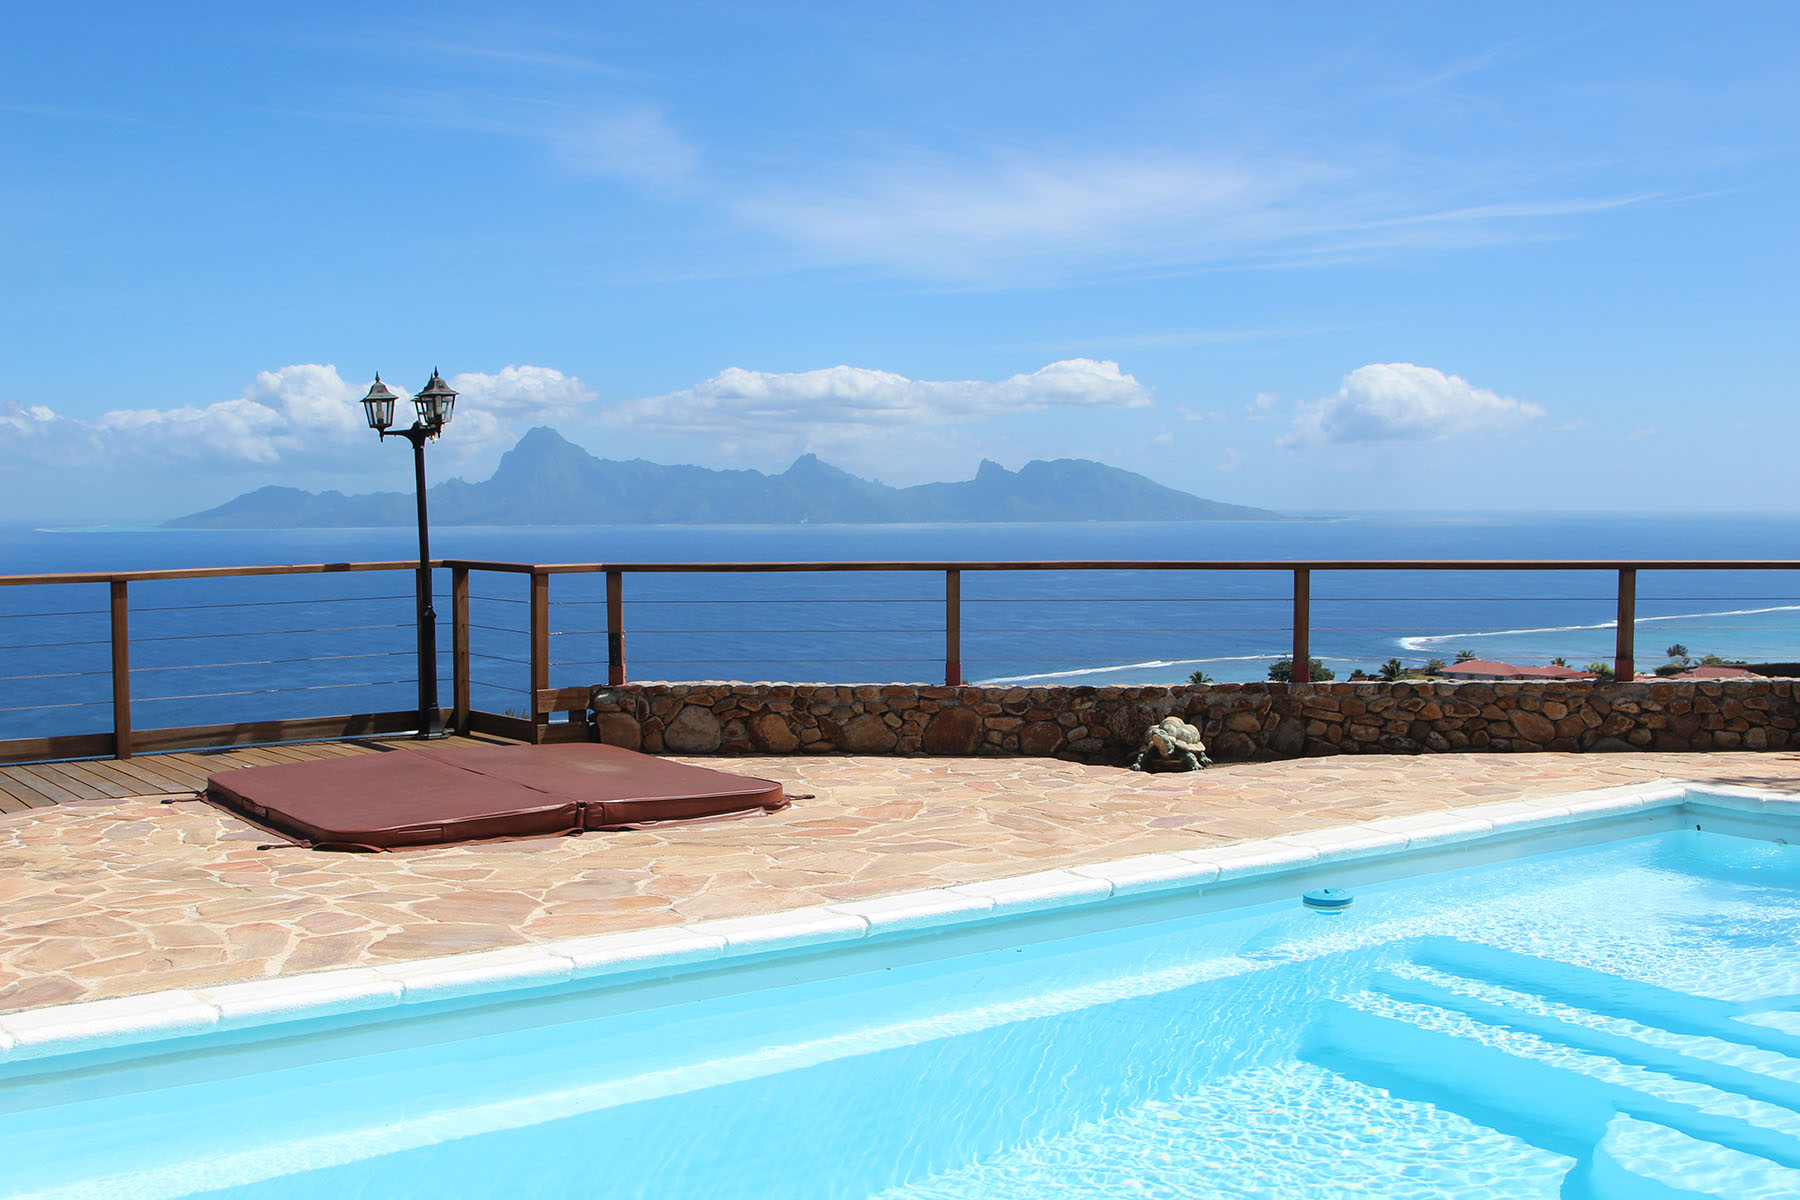 Casa Unifamiliar por un Venta en Family house with a panoramic view on ocean and Moorea Tahiti, French Polynesia